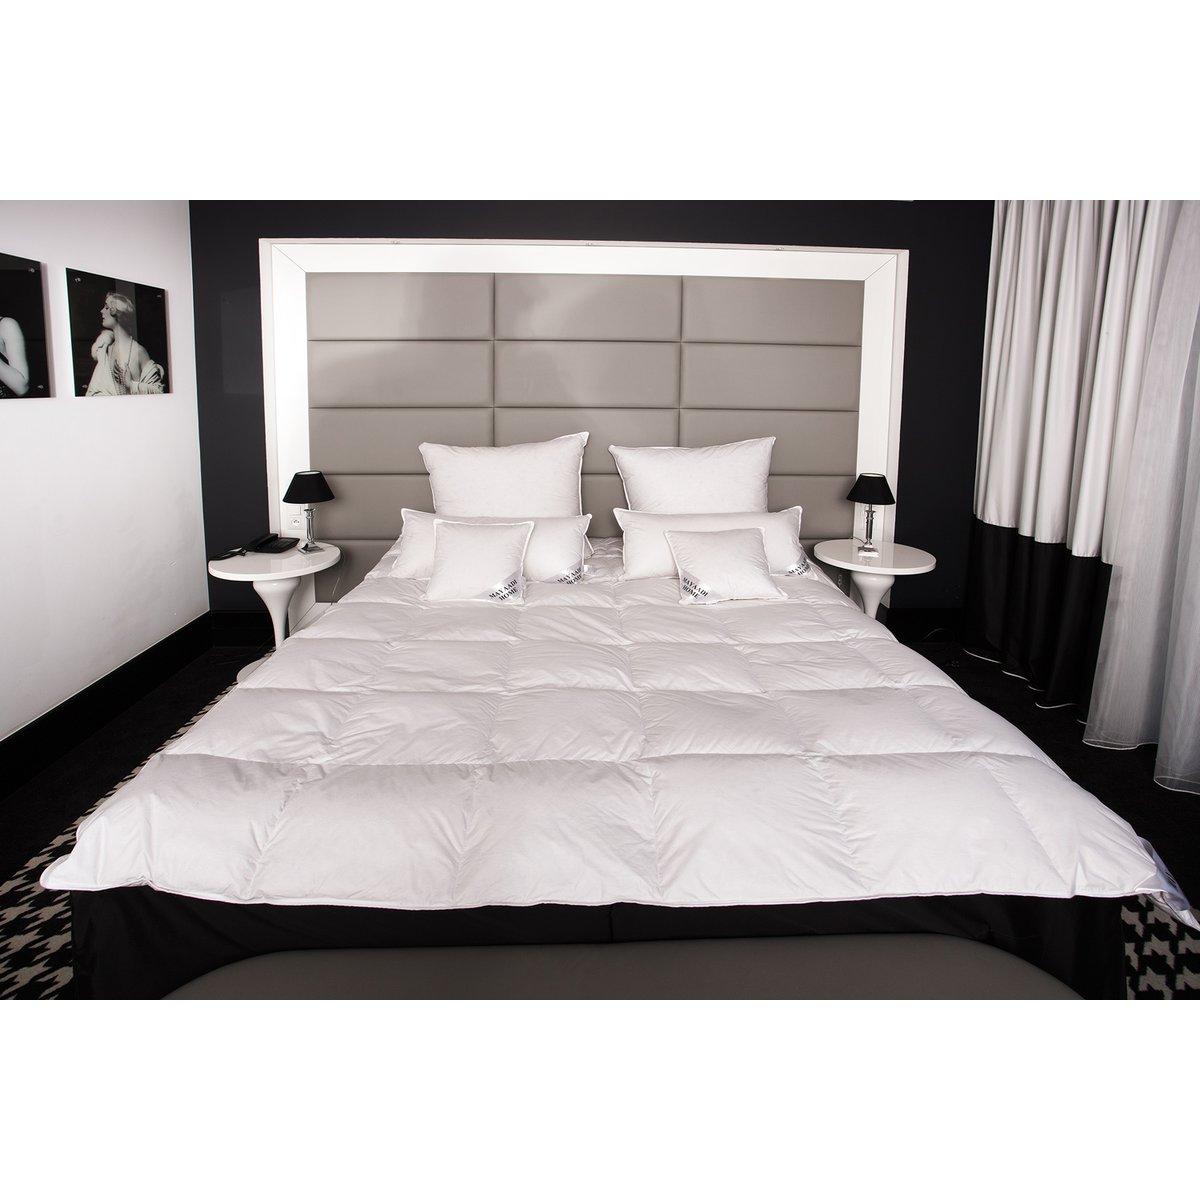 bettdecken mit daunen. Black Bedroom Furniture Sets. Home Design Ideas